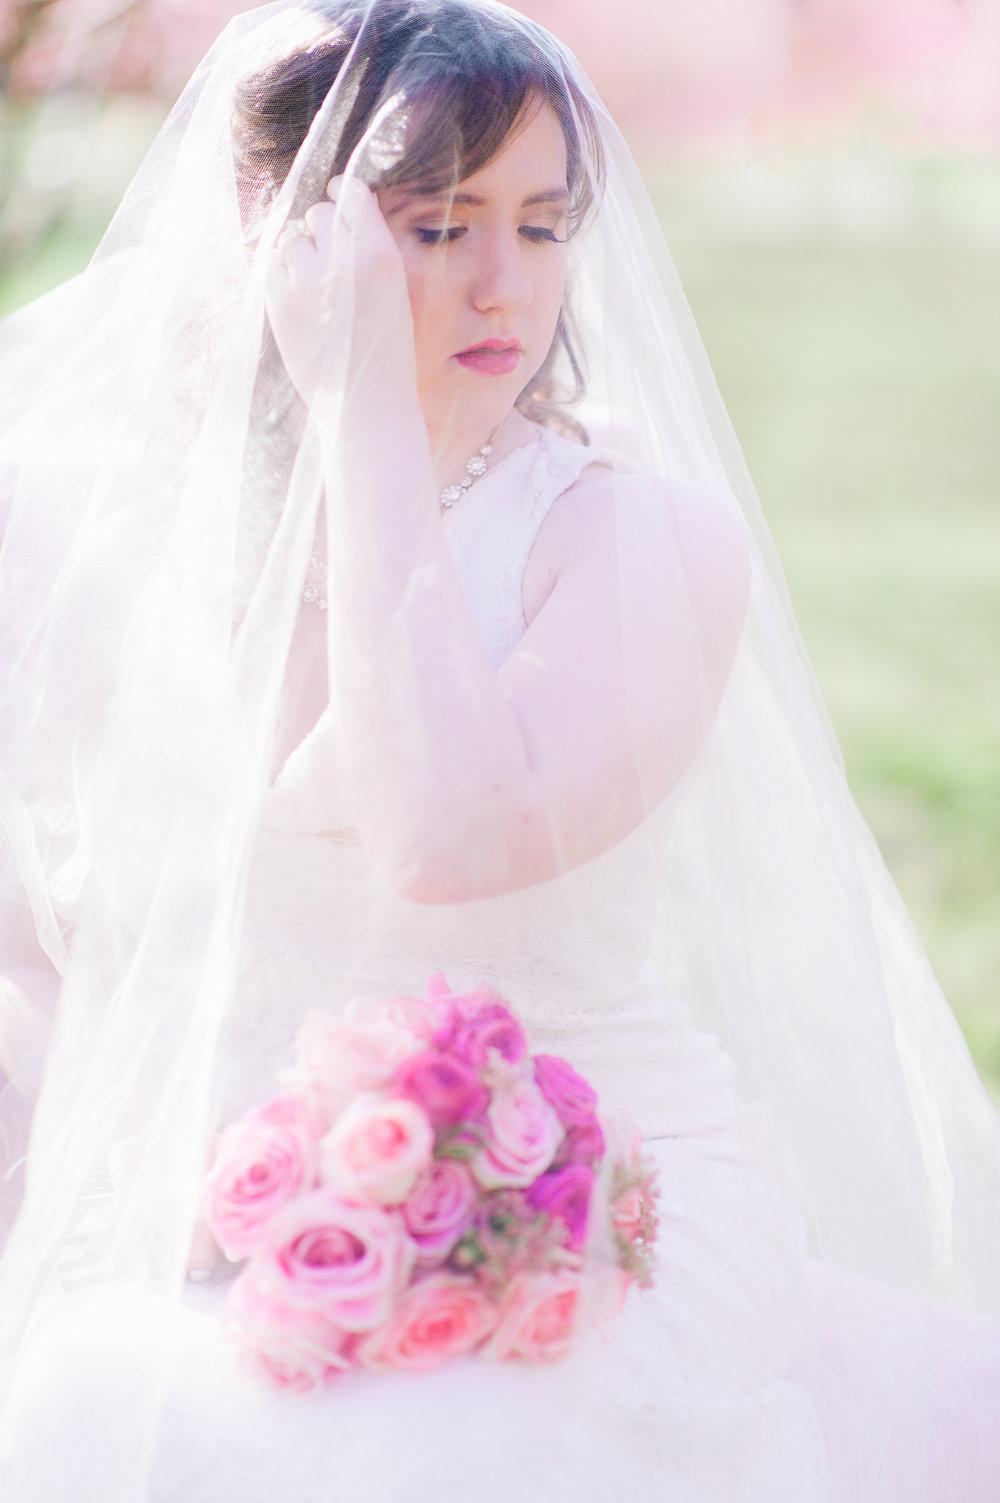 springwedding_cherryblossoms_virginiaphotographer_youseephotography_styledshoot (498).jpg